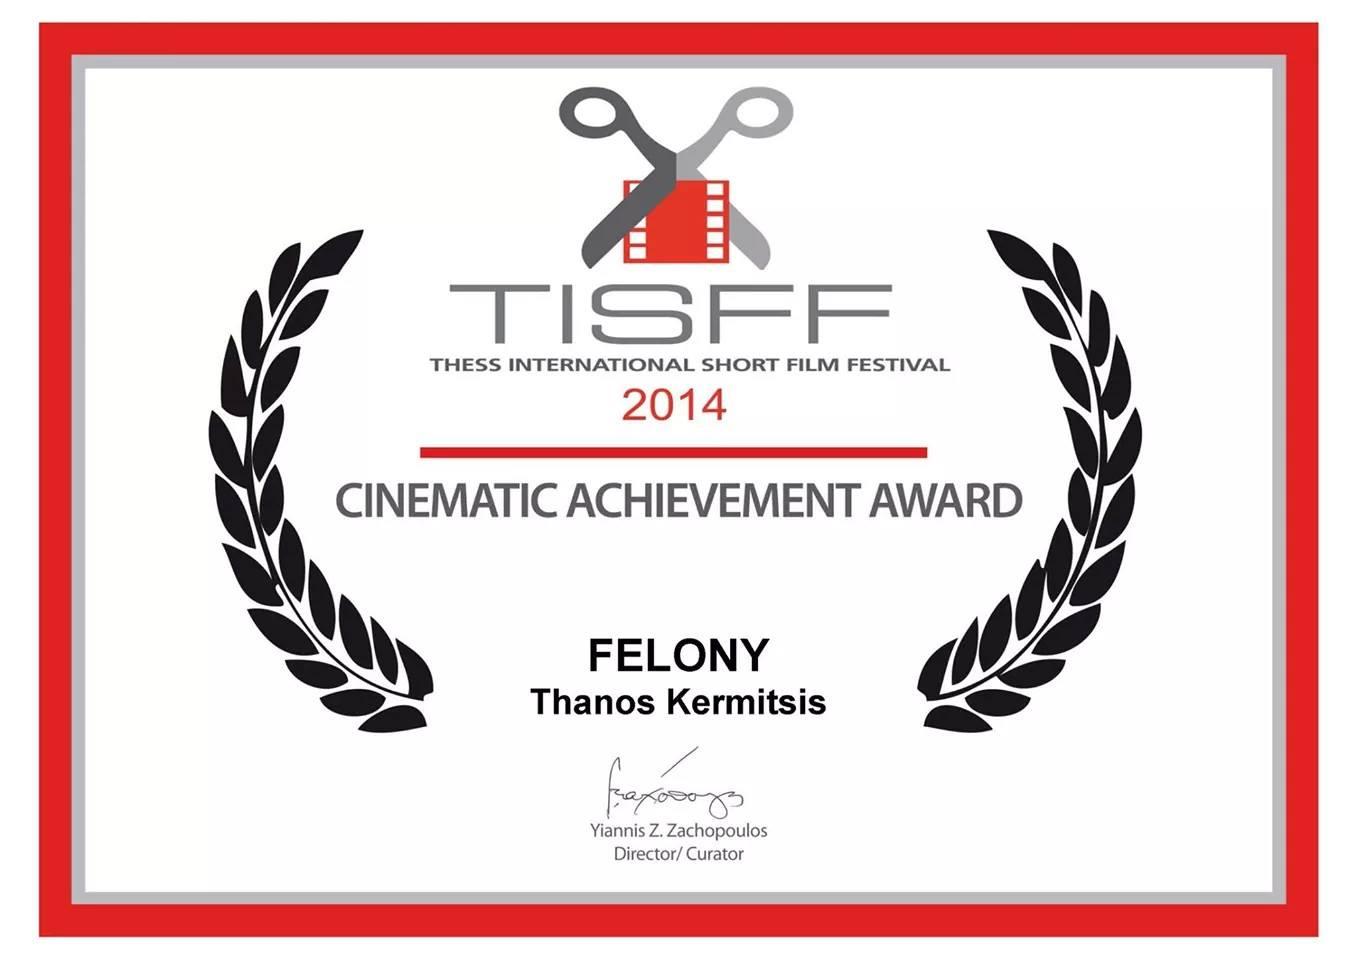 Cinematic Achievement Award